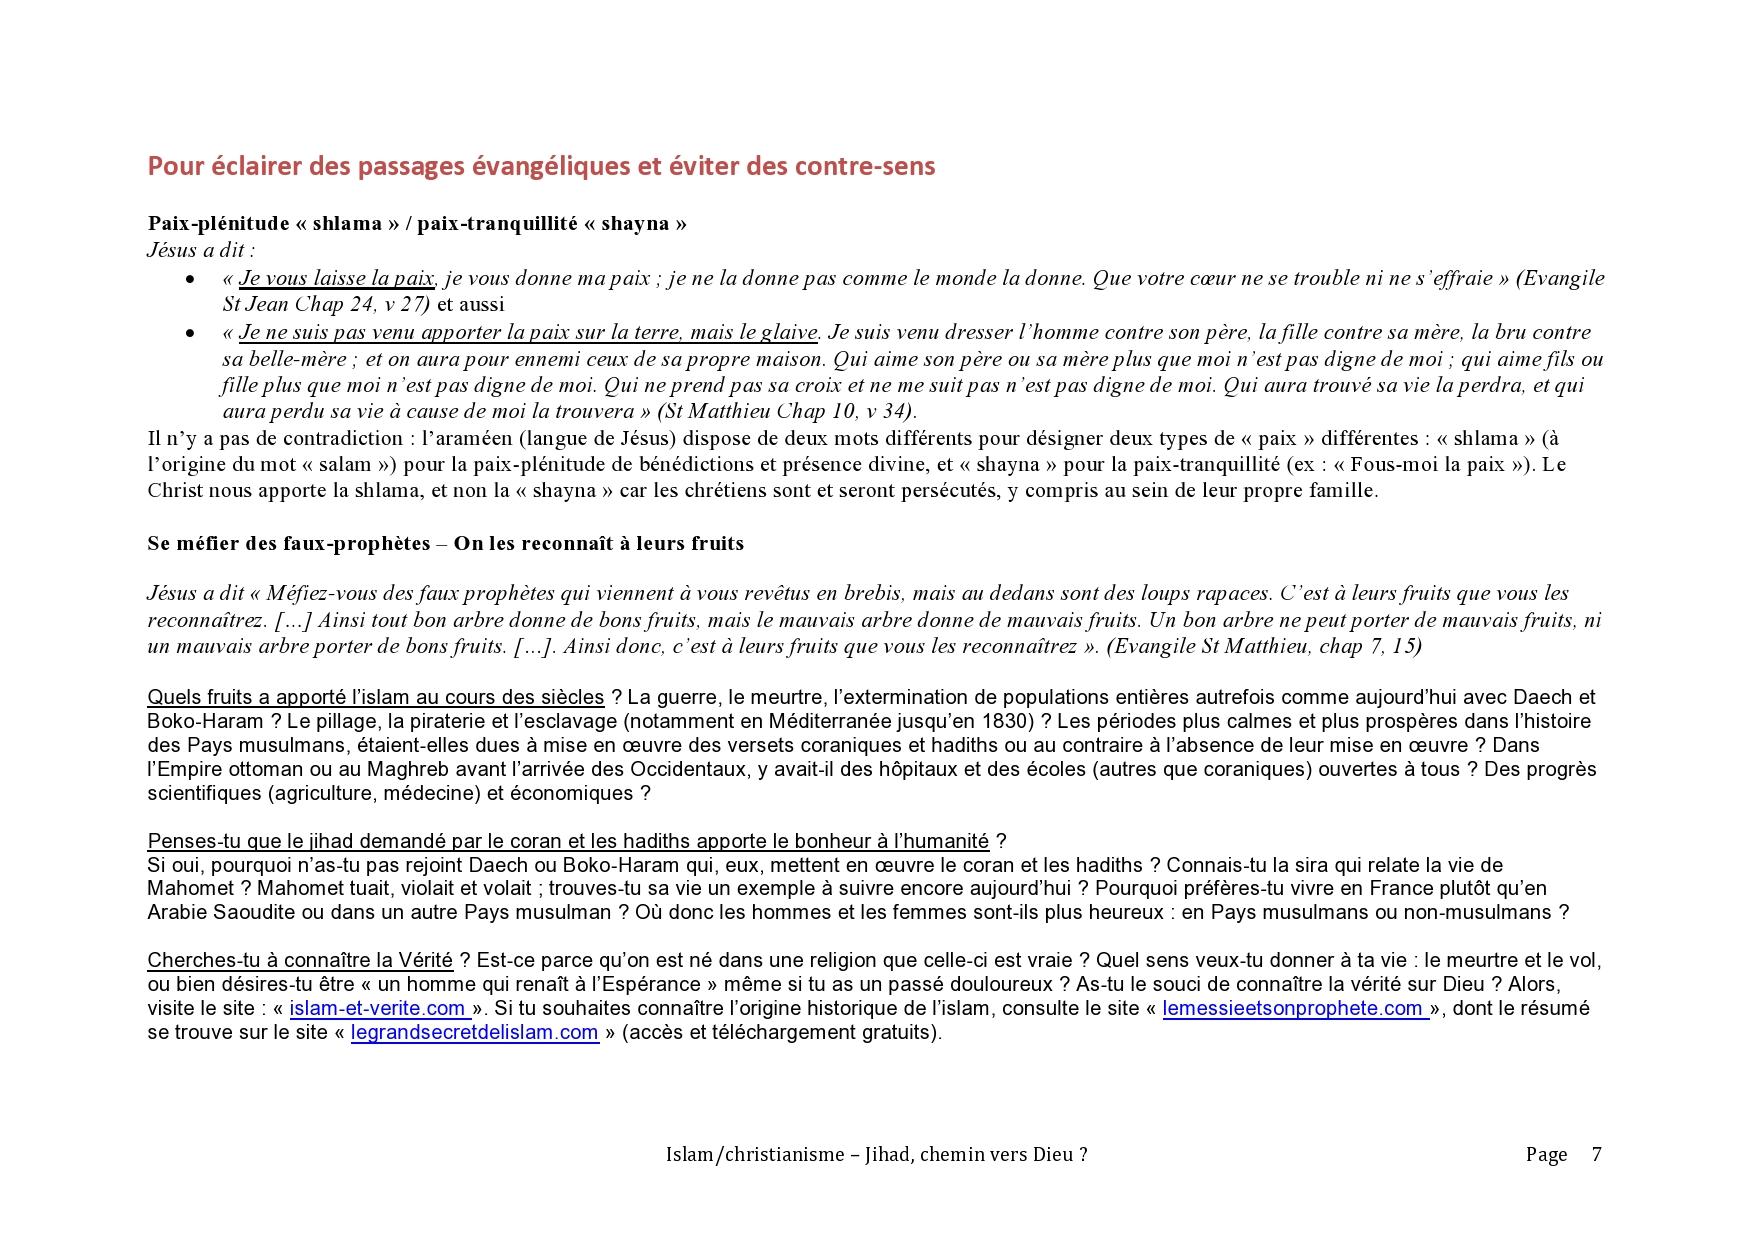 islam-christianisme-jihad-page0007